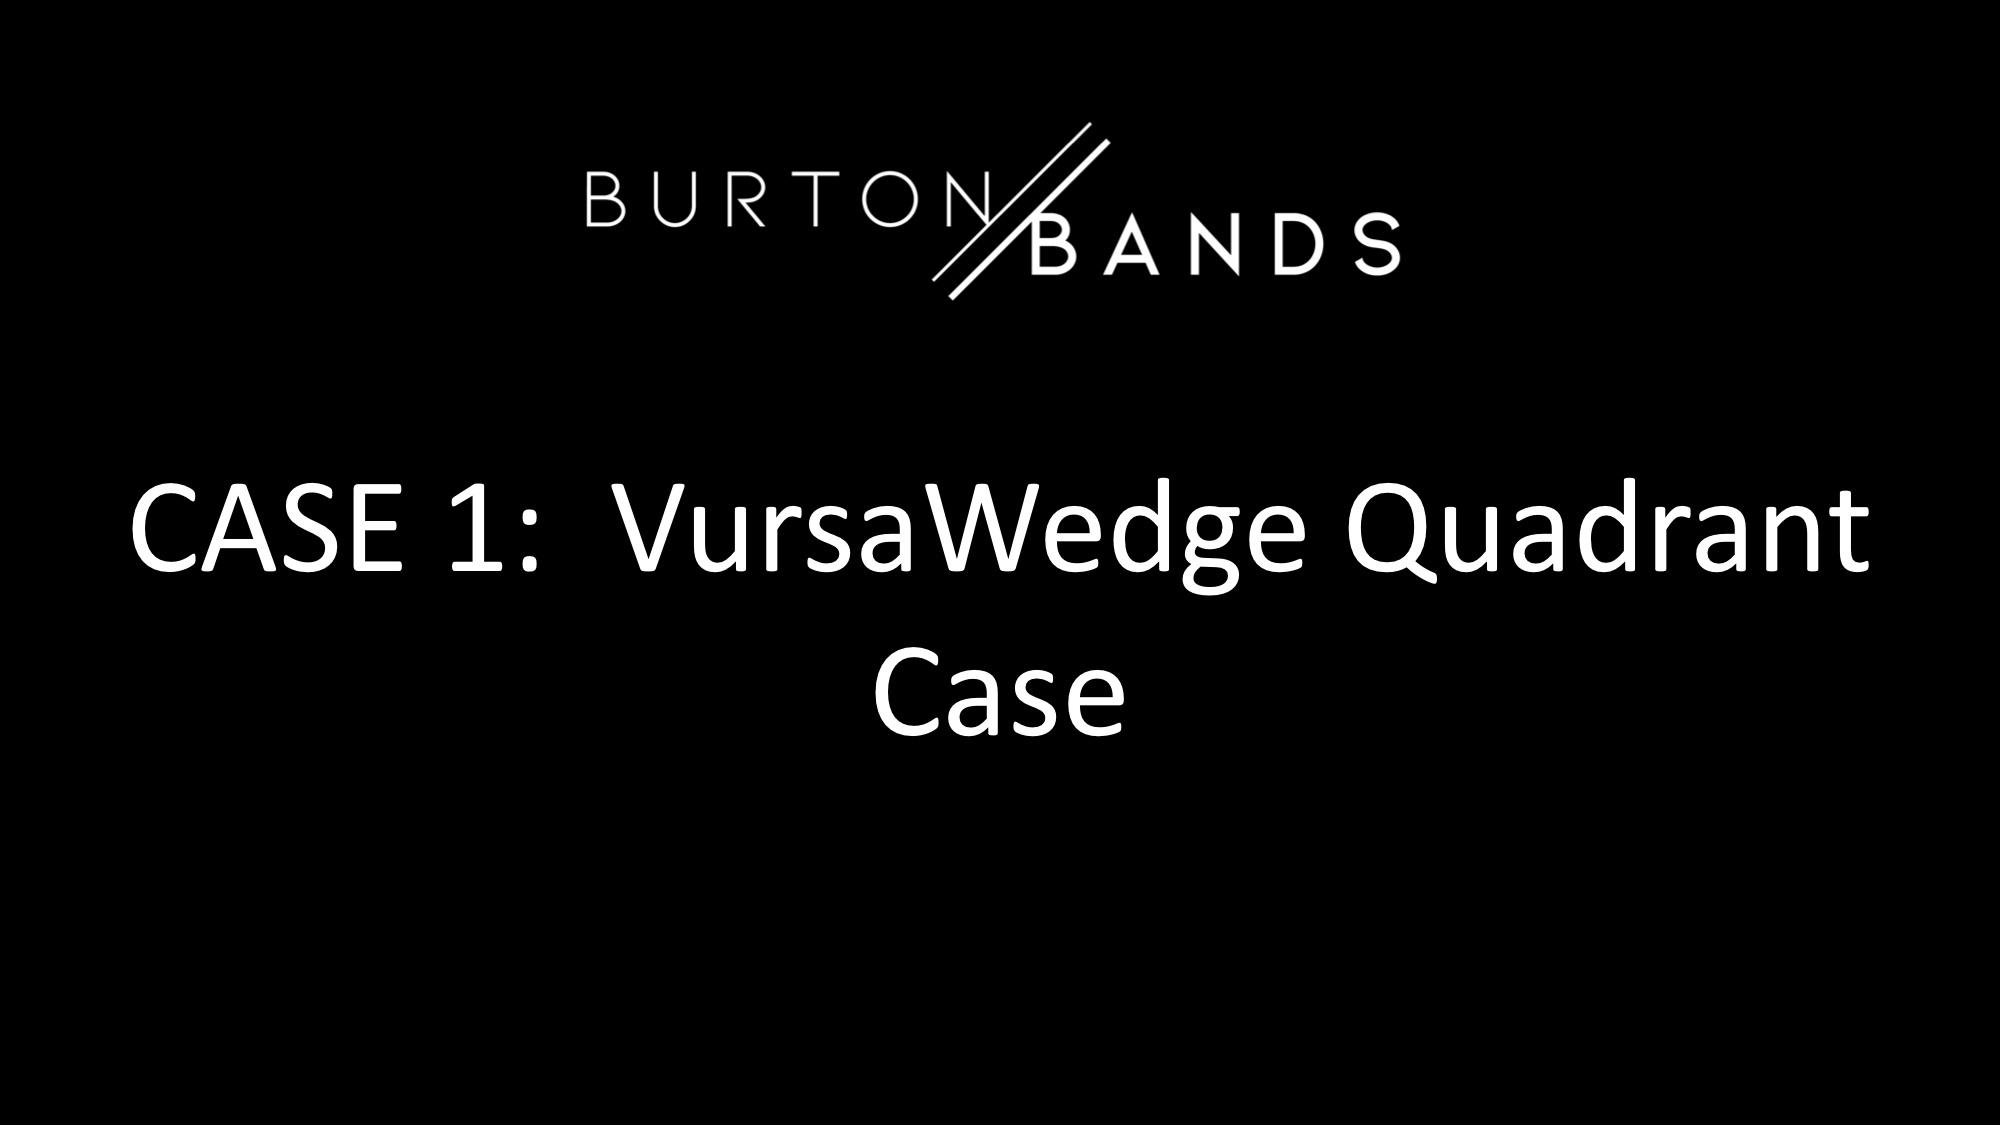 vw-case-1.jpg